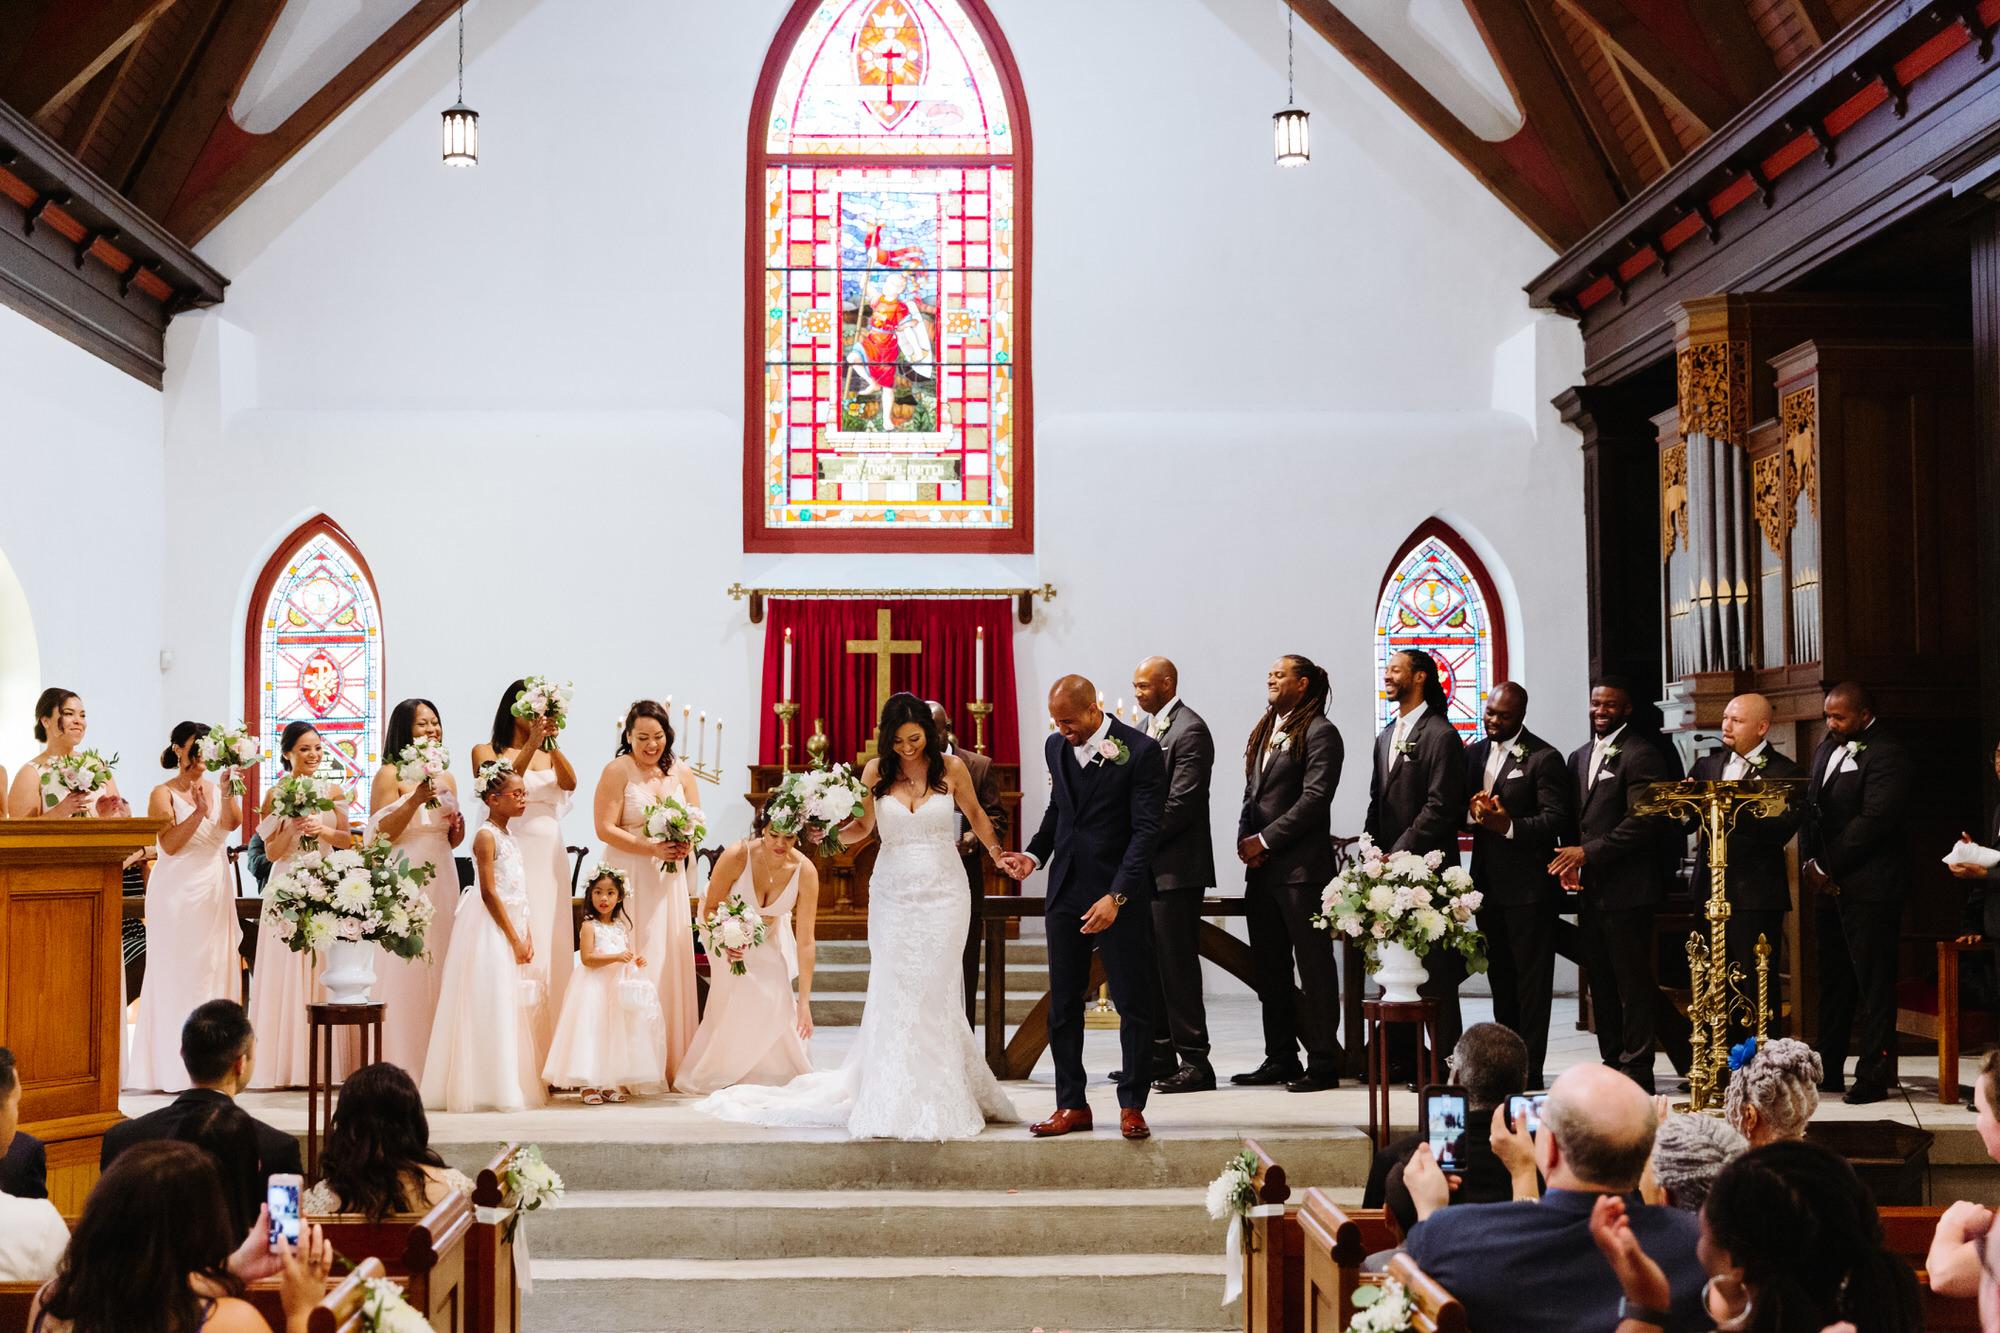 st-lukes-chapel-cannon-green-charleston-wedding-932.JPG